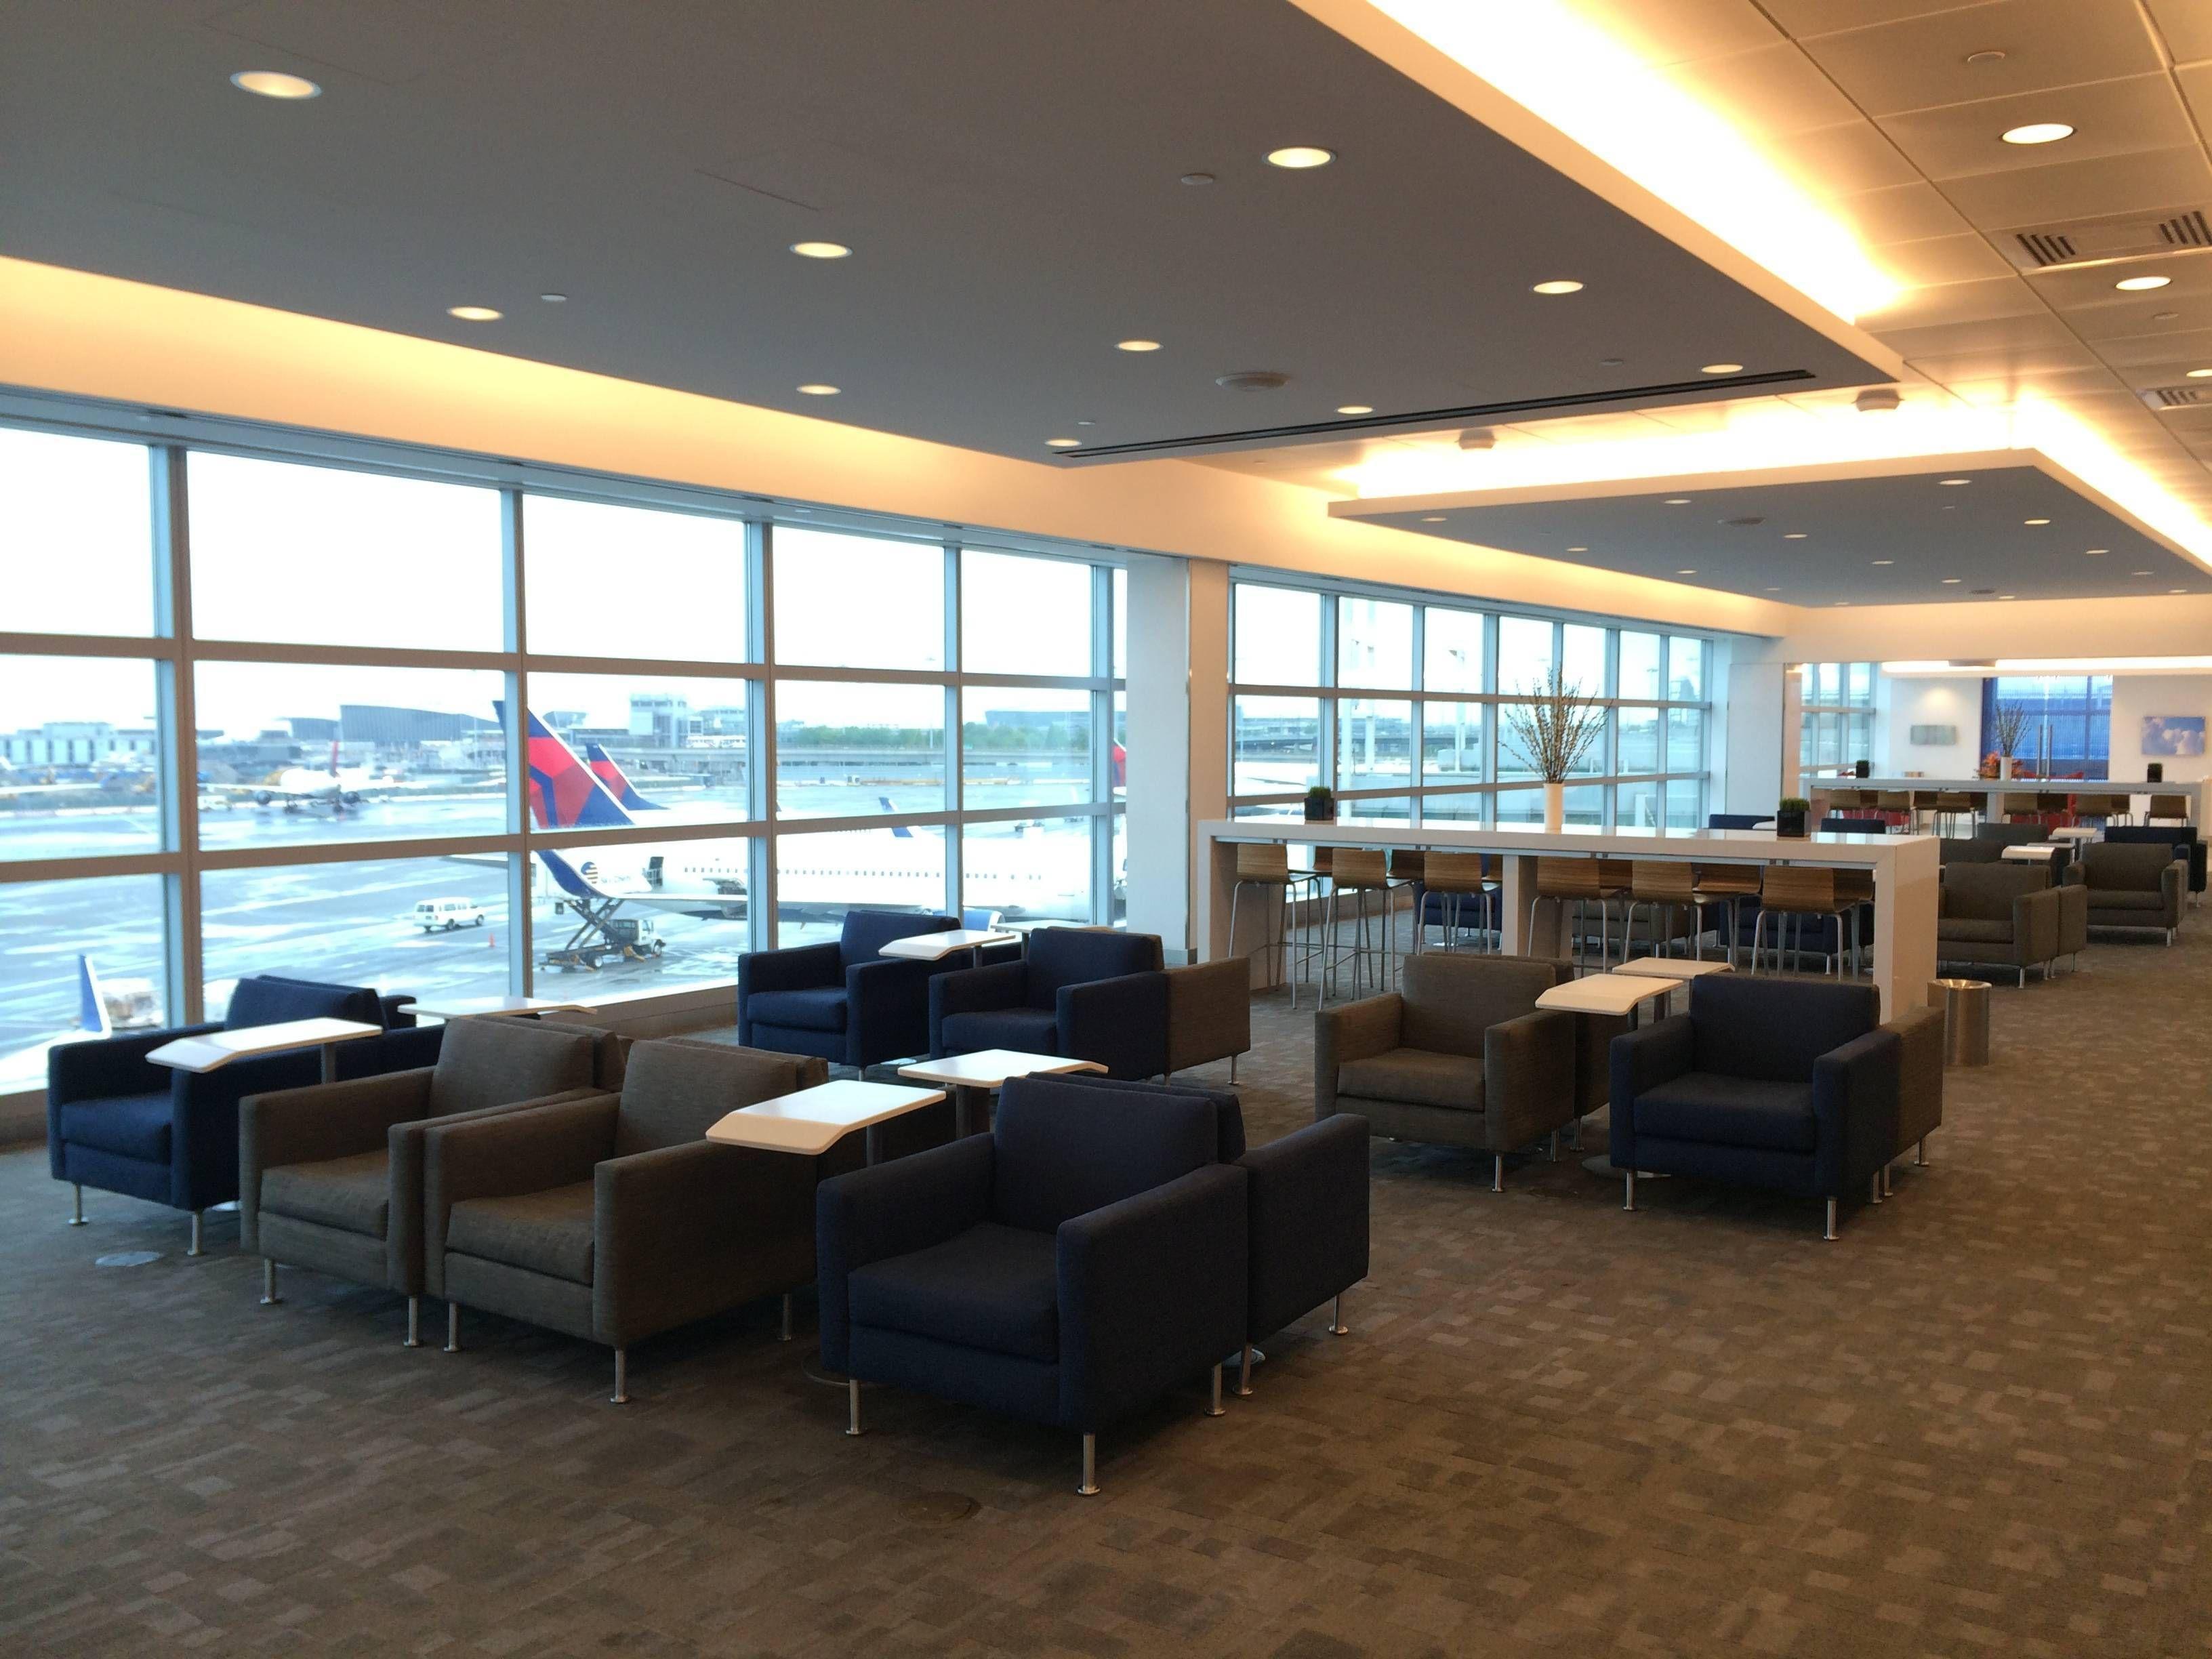 Delta Skyclub JFK sala vip passageirodeprimeira